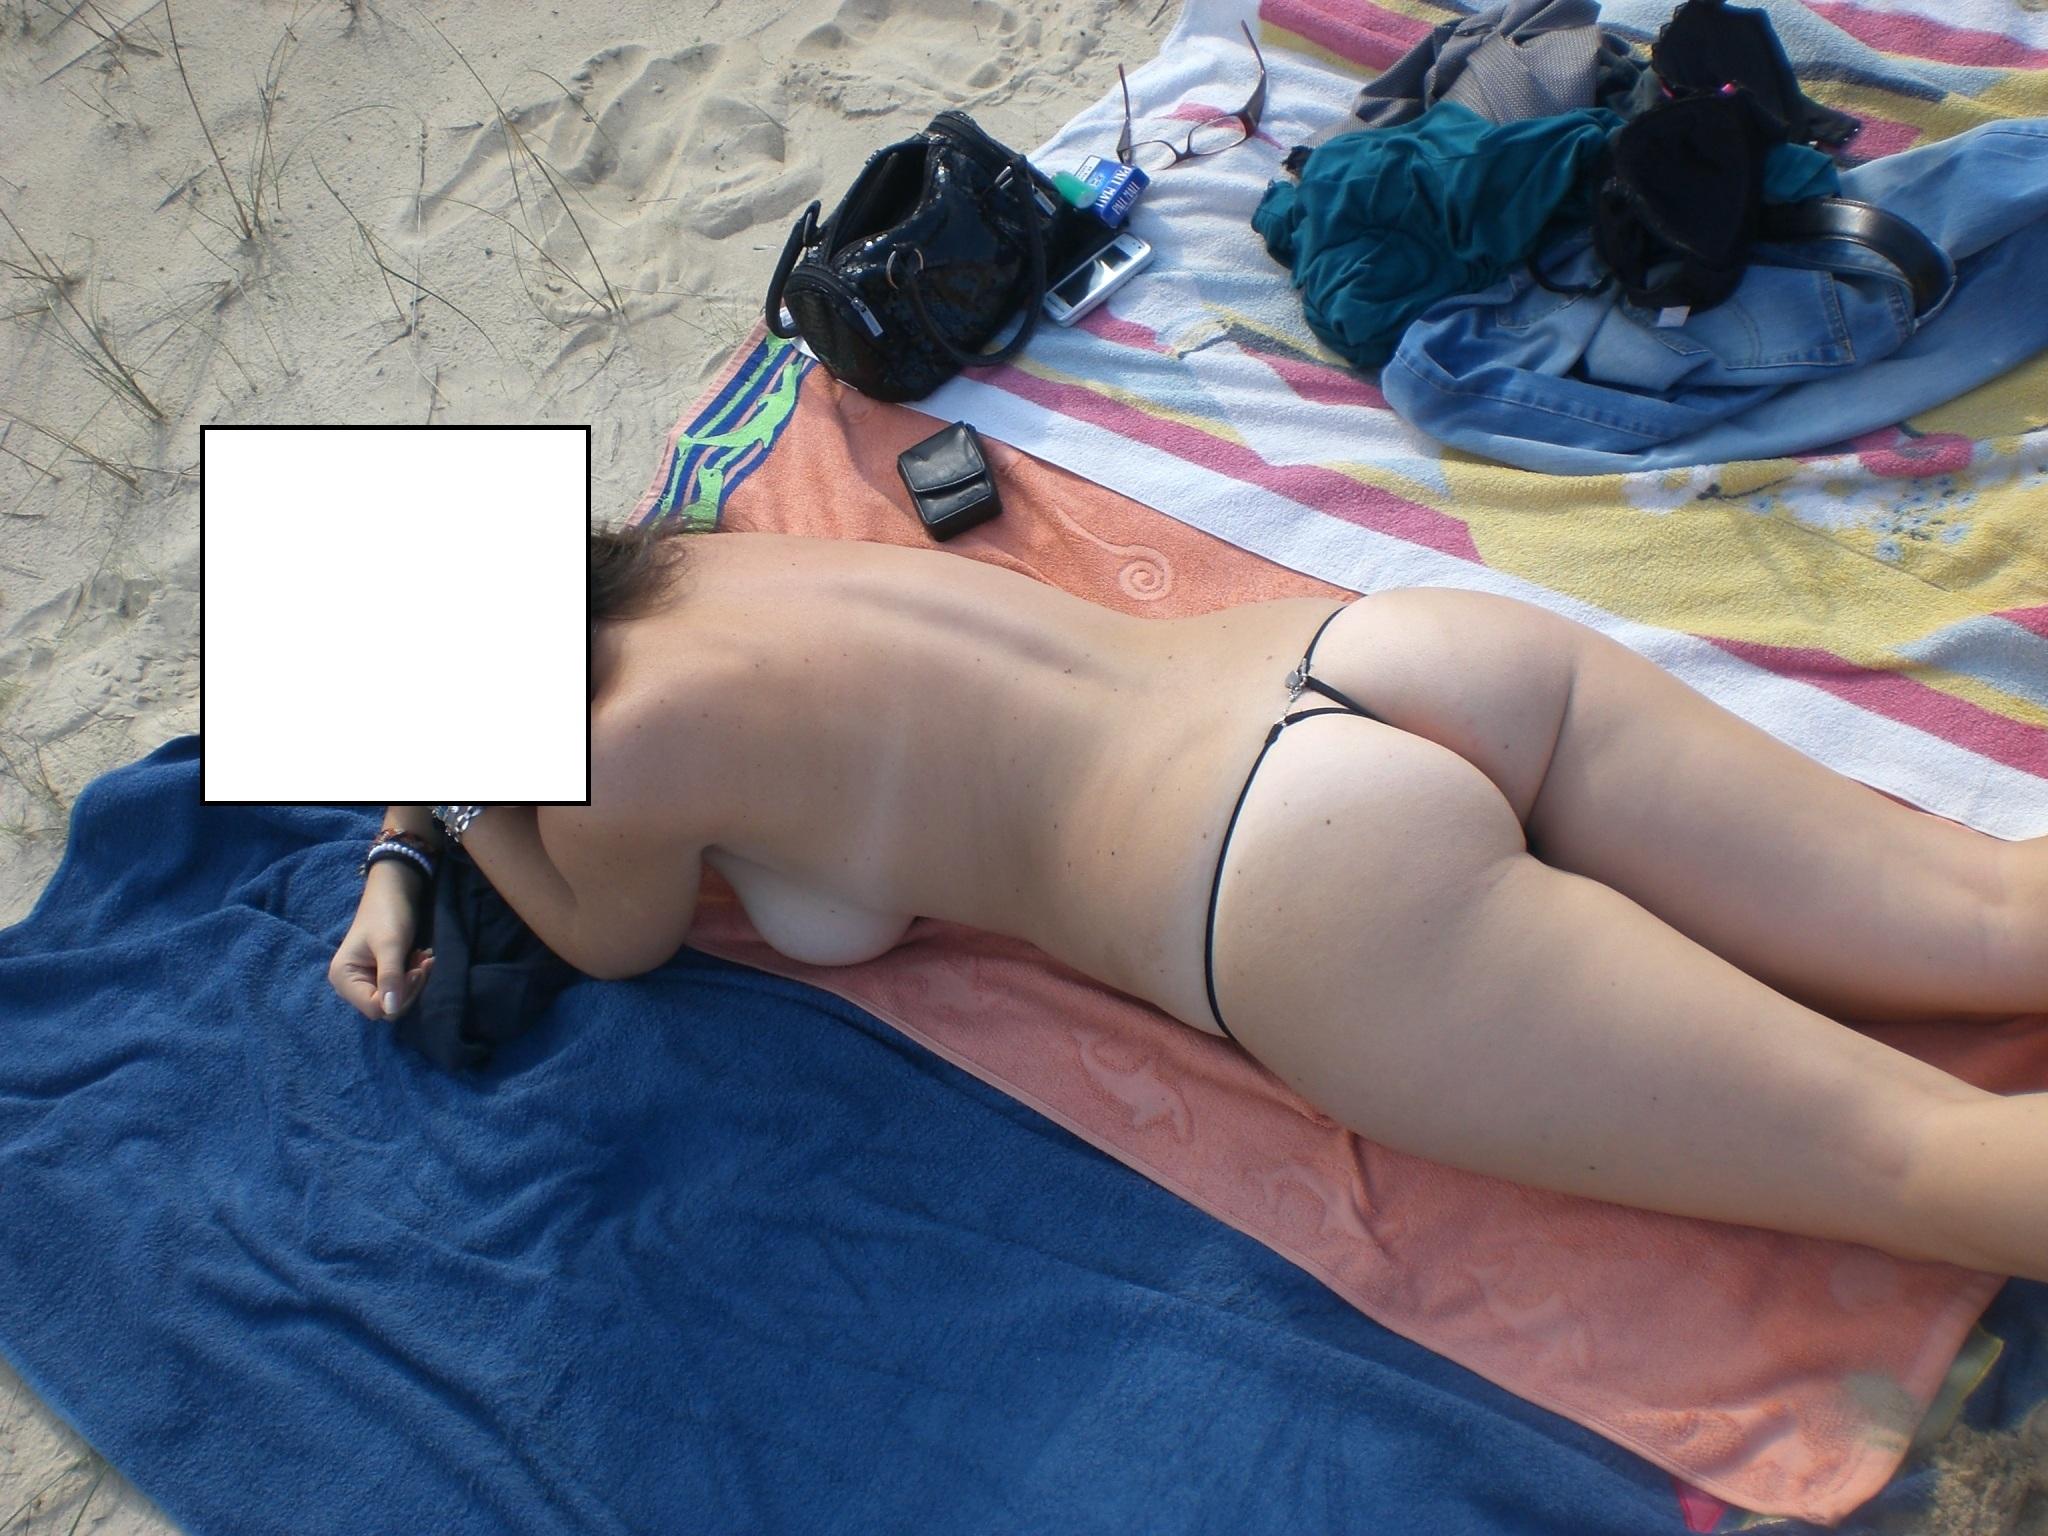 test erotico badoo sign in